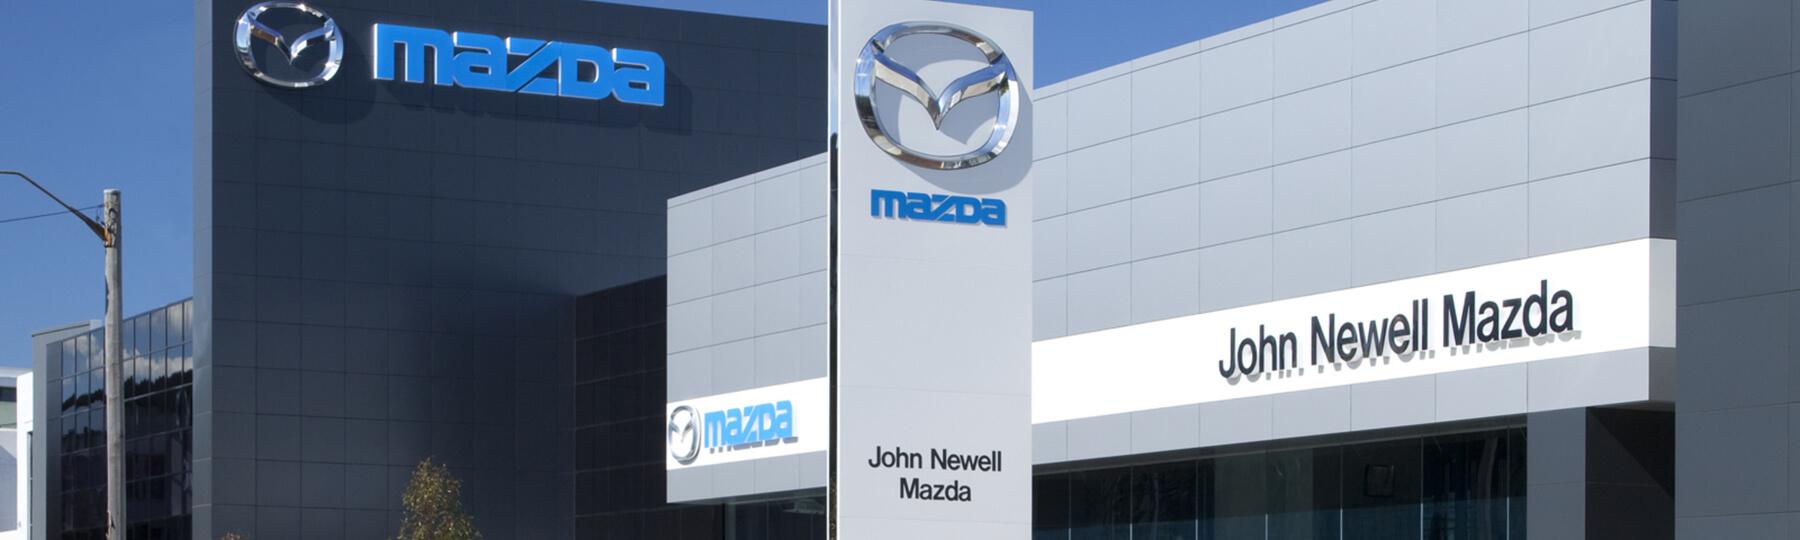 John Newell Mazda